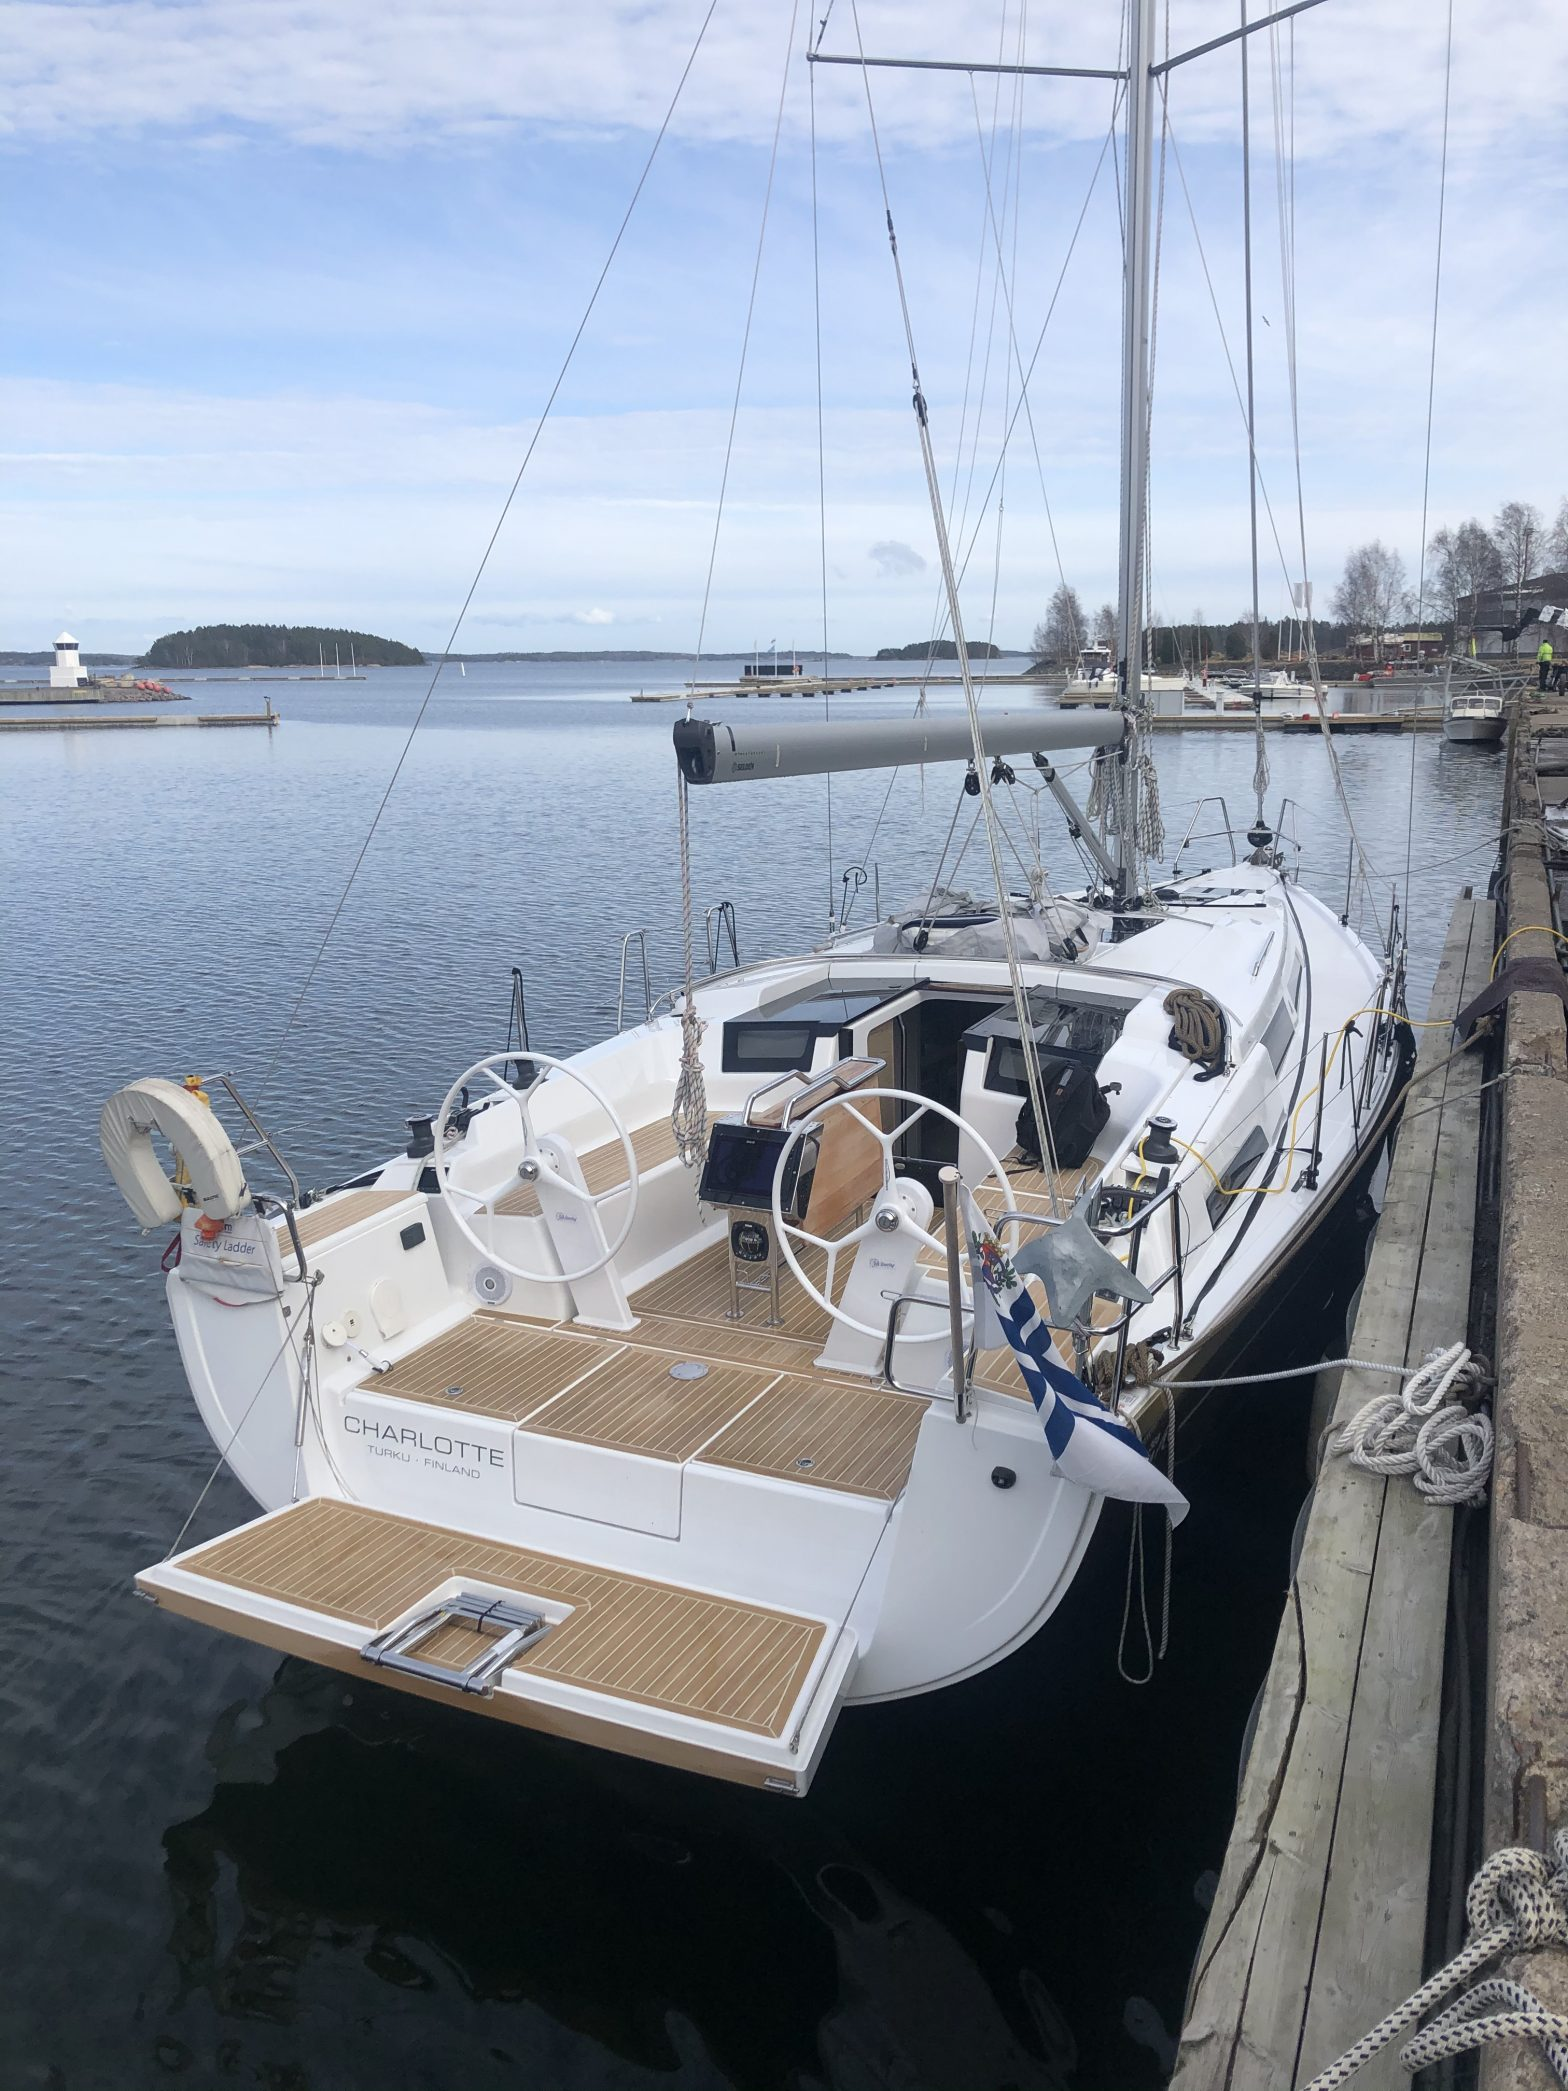 s/y Charlotte, Hanse 388 in Dalsbruk